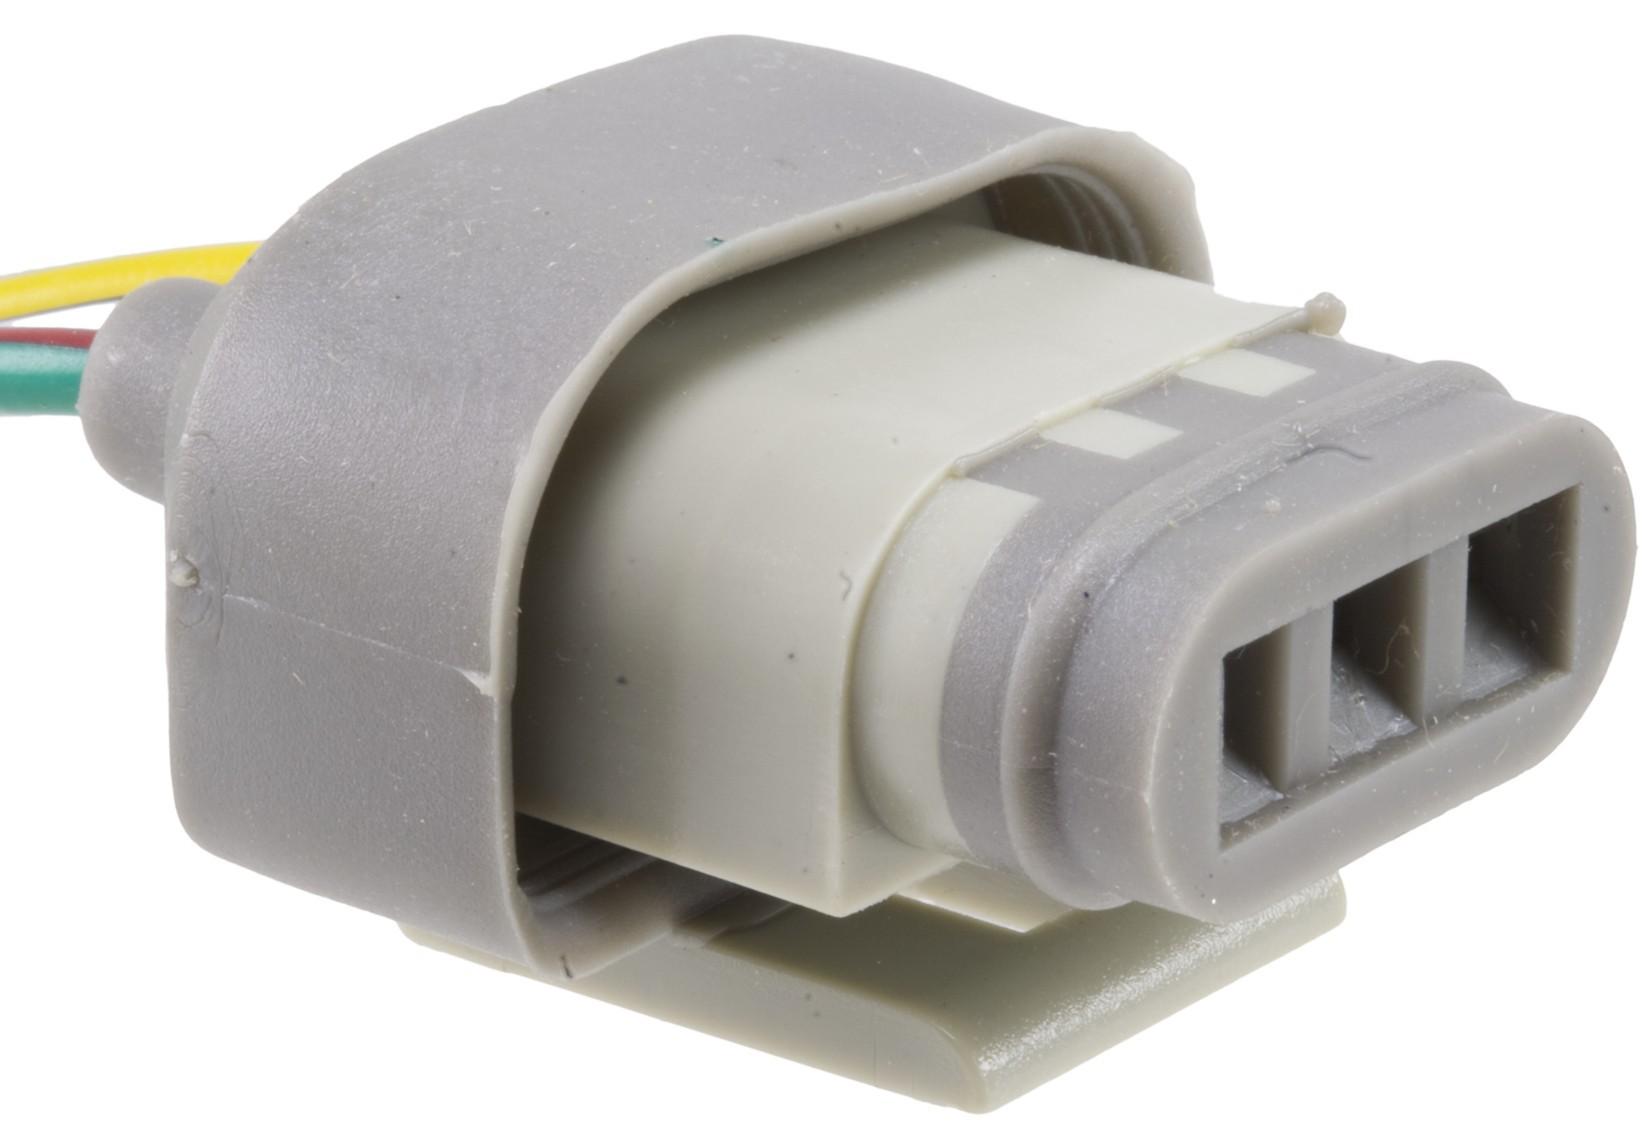 WELLS - Engine Coolant Level Sensor Connector - WEL 224